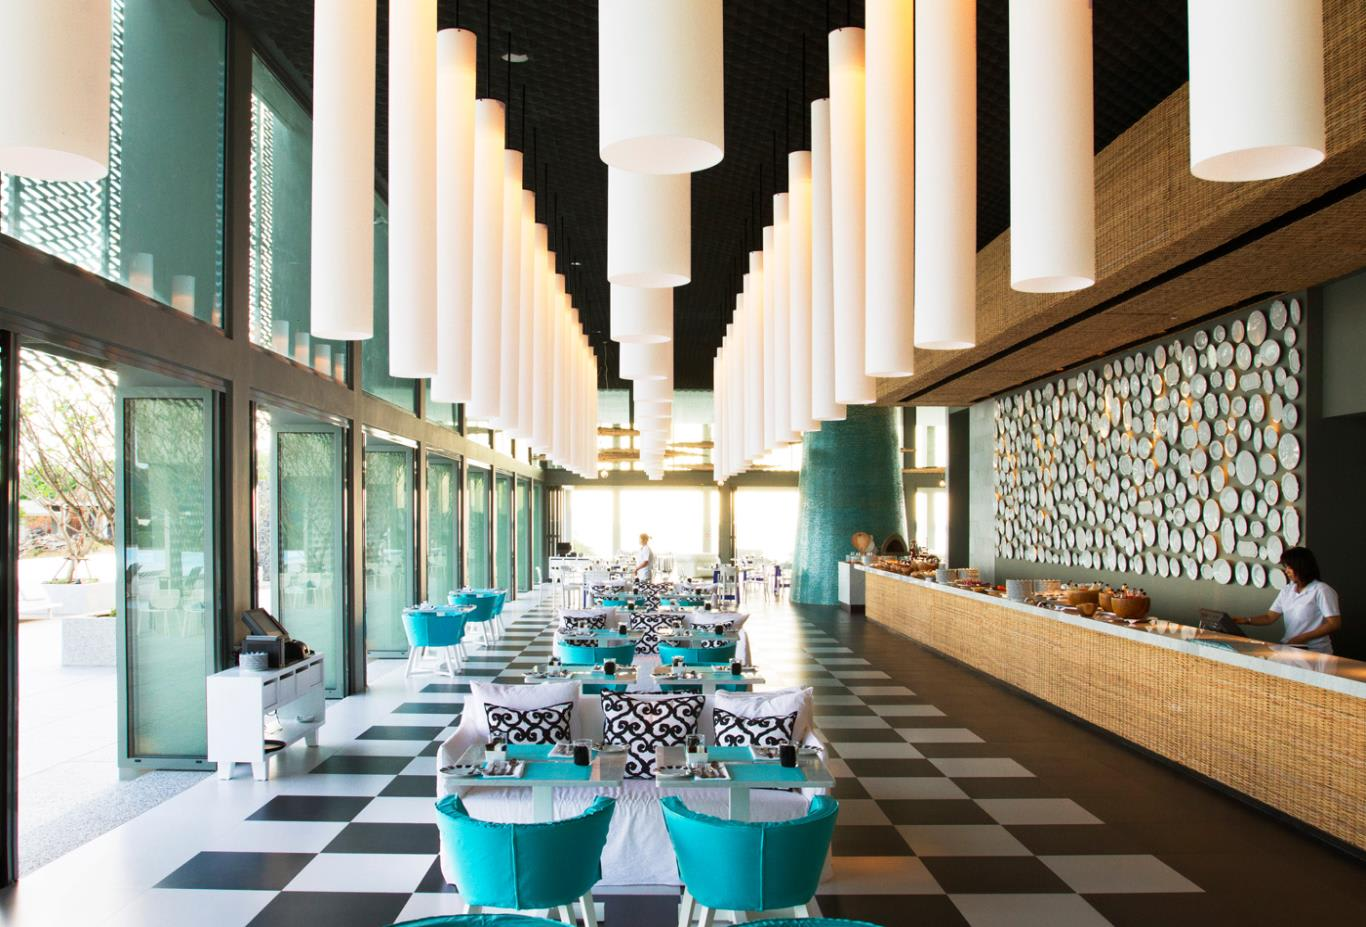 La Sirena Restaurant